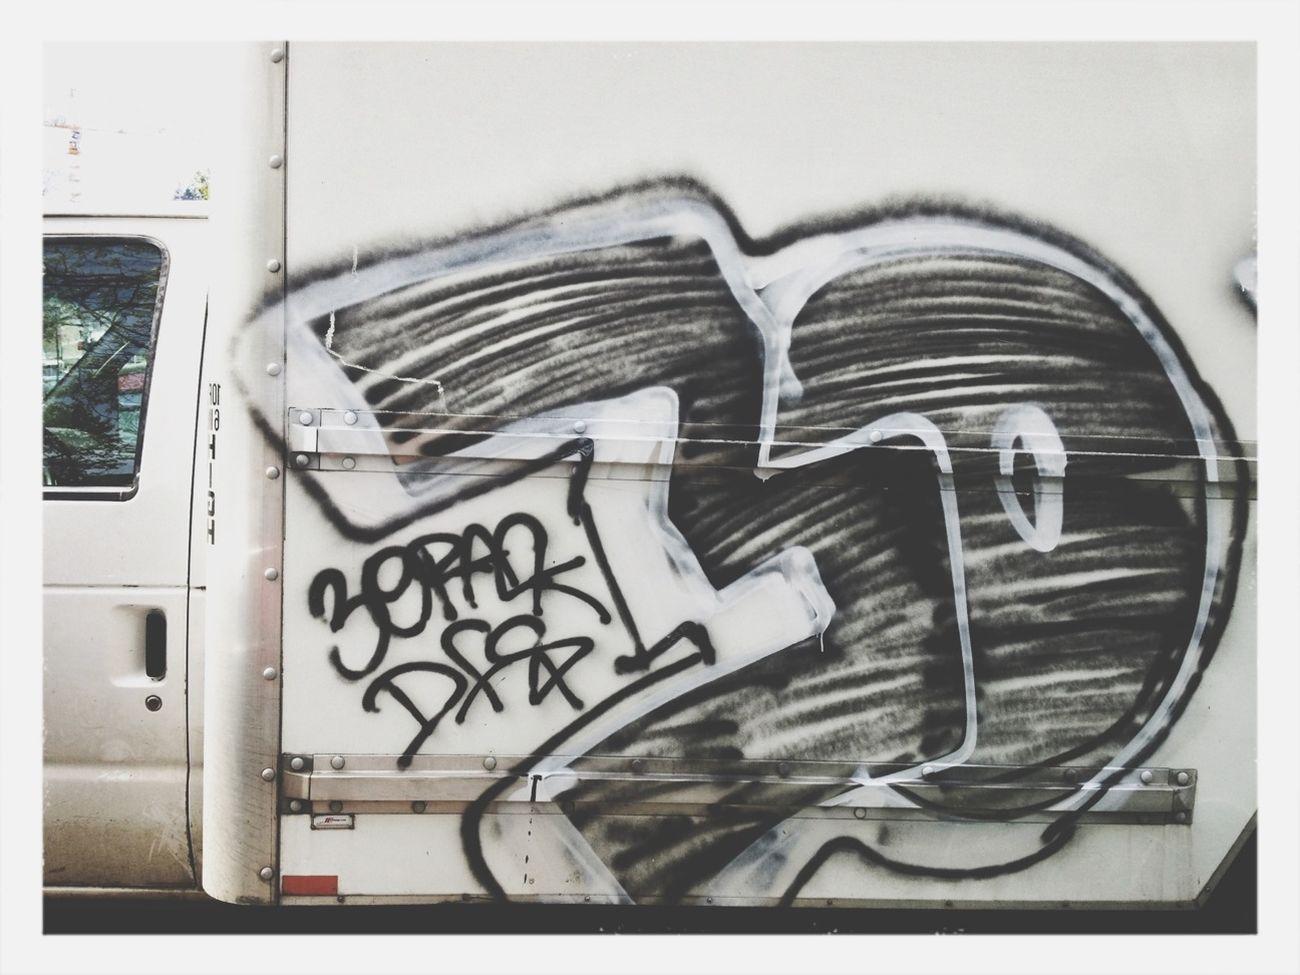 MOPA30 Show Us